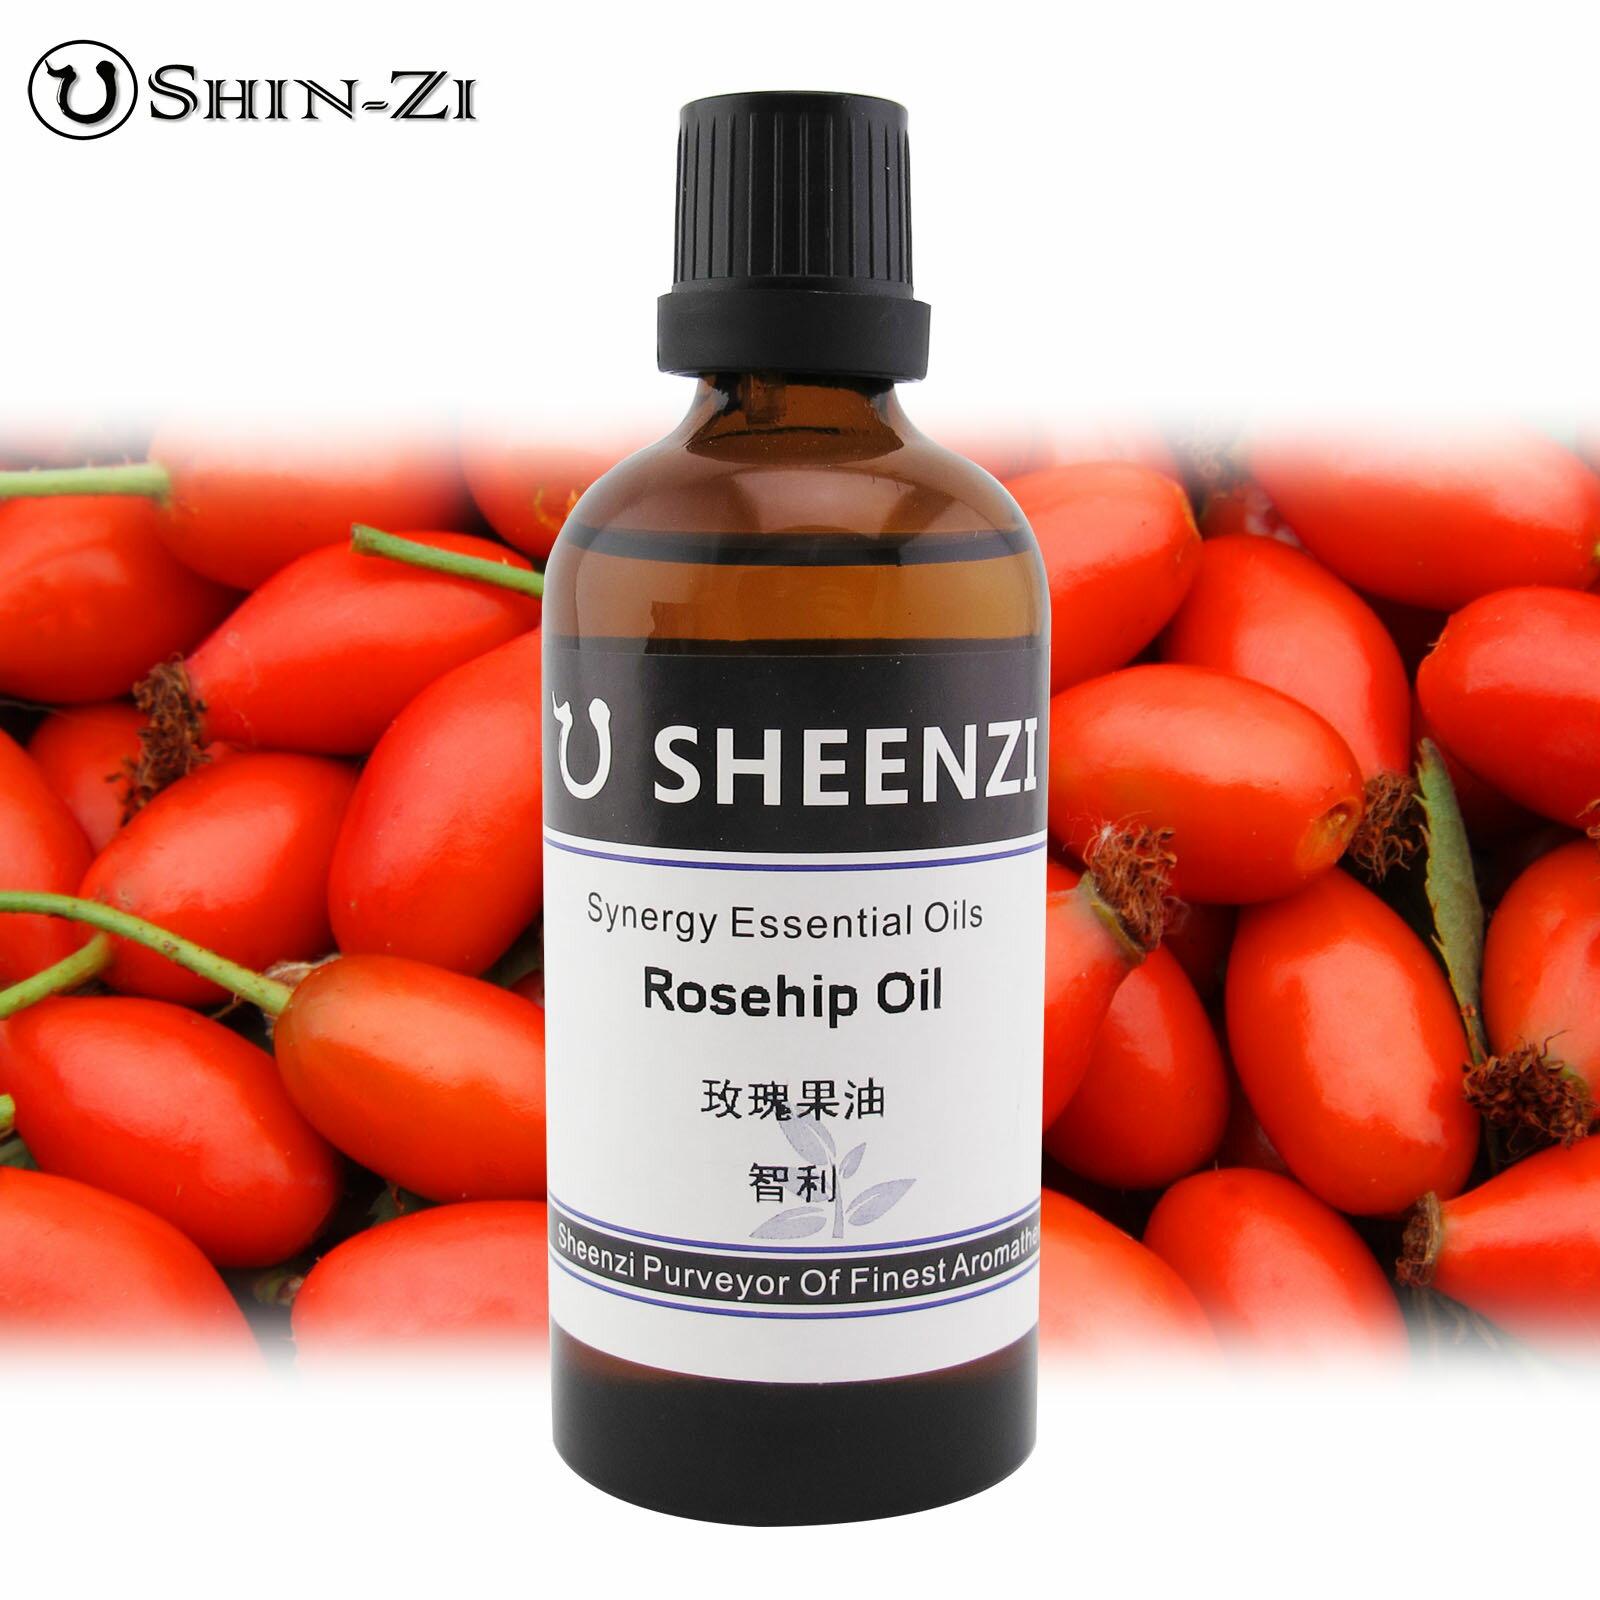 100ml / 1L / 5L 初榨玫瑰果油天然基礎油(智利產區) Rose Hip Oil頂級身體按摩油 植物油 身體按摩油 SPA用油 基底油